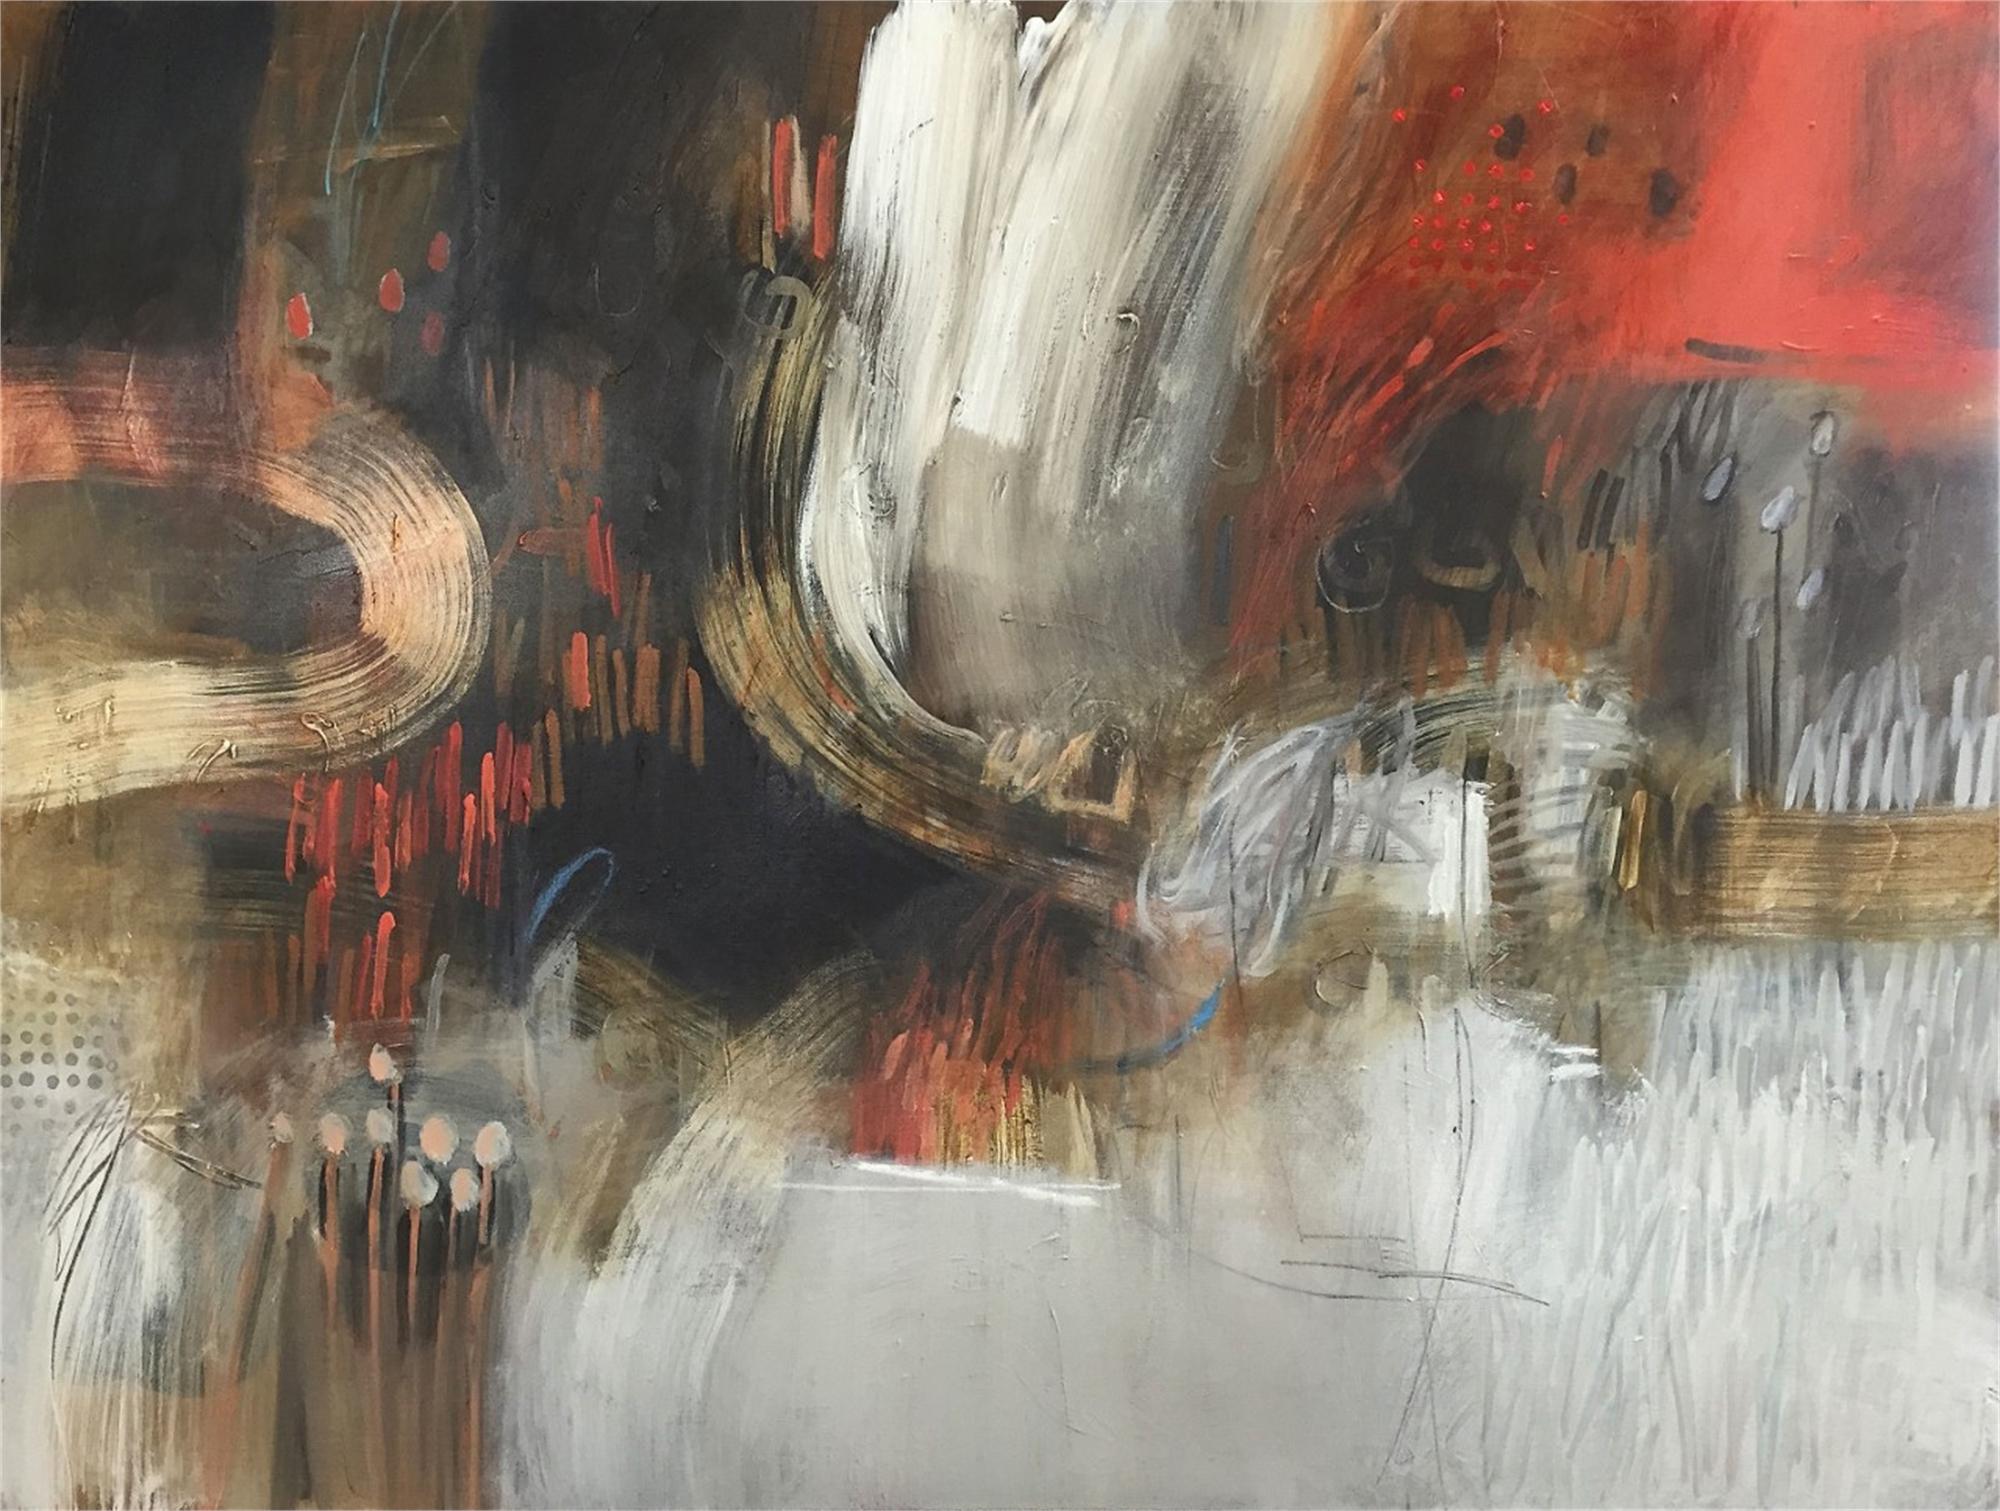 Untitled 162151 by Karen Roehl